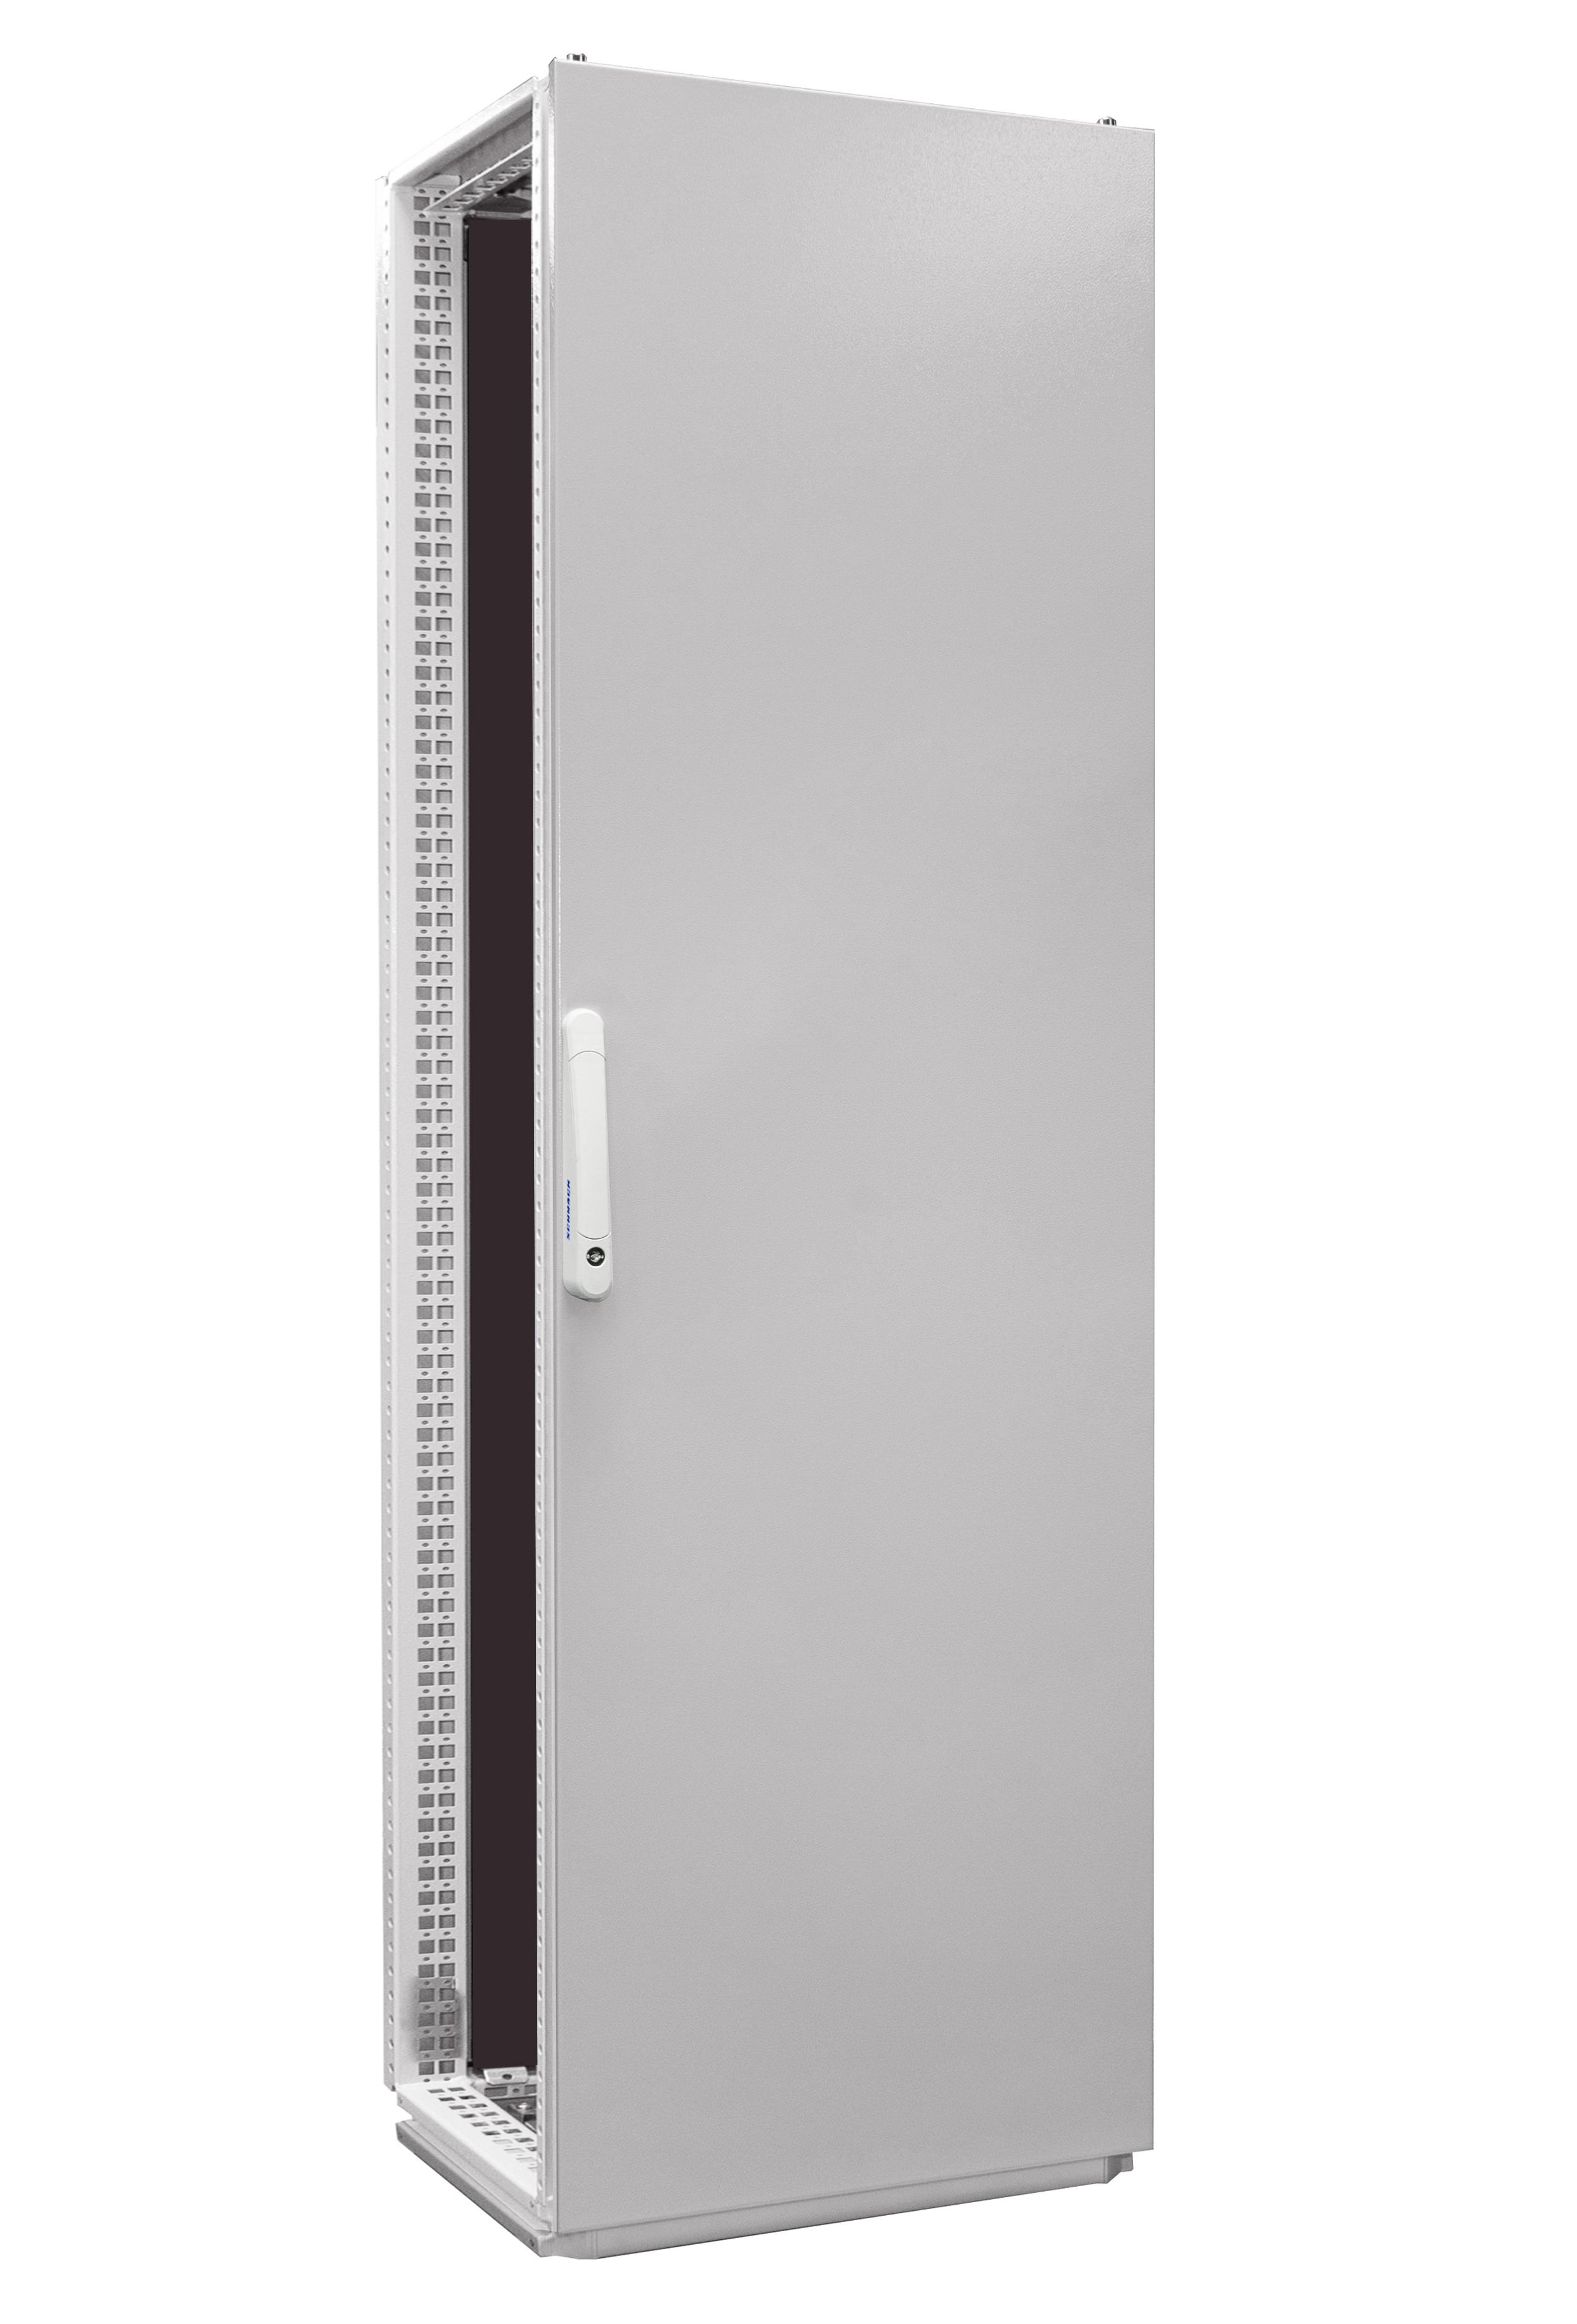 1 Stk Anreihschrank 1-Tür IP55 H=2000 B=600 T=600mm Stahlblech AC206061--